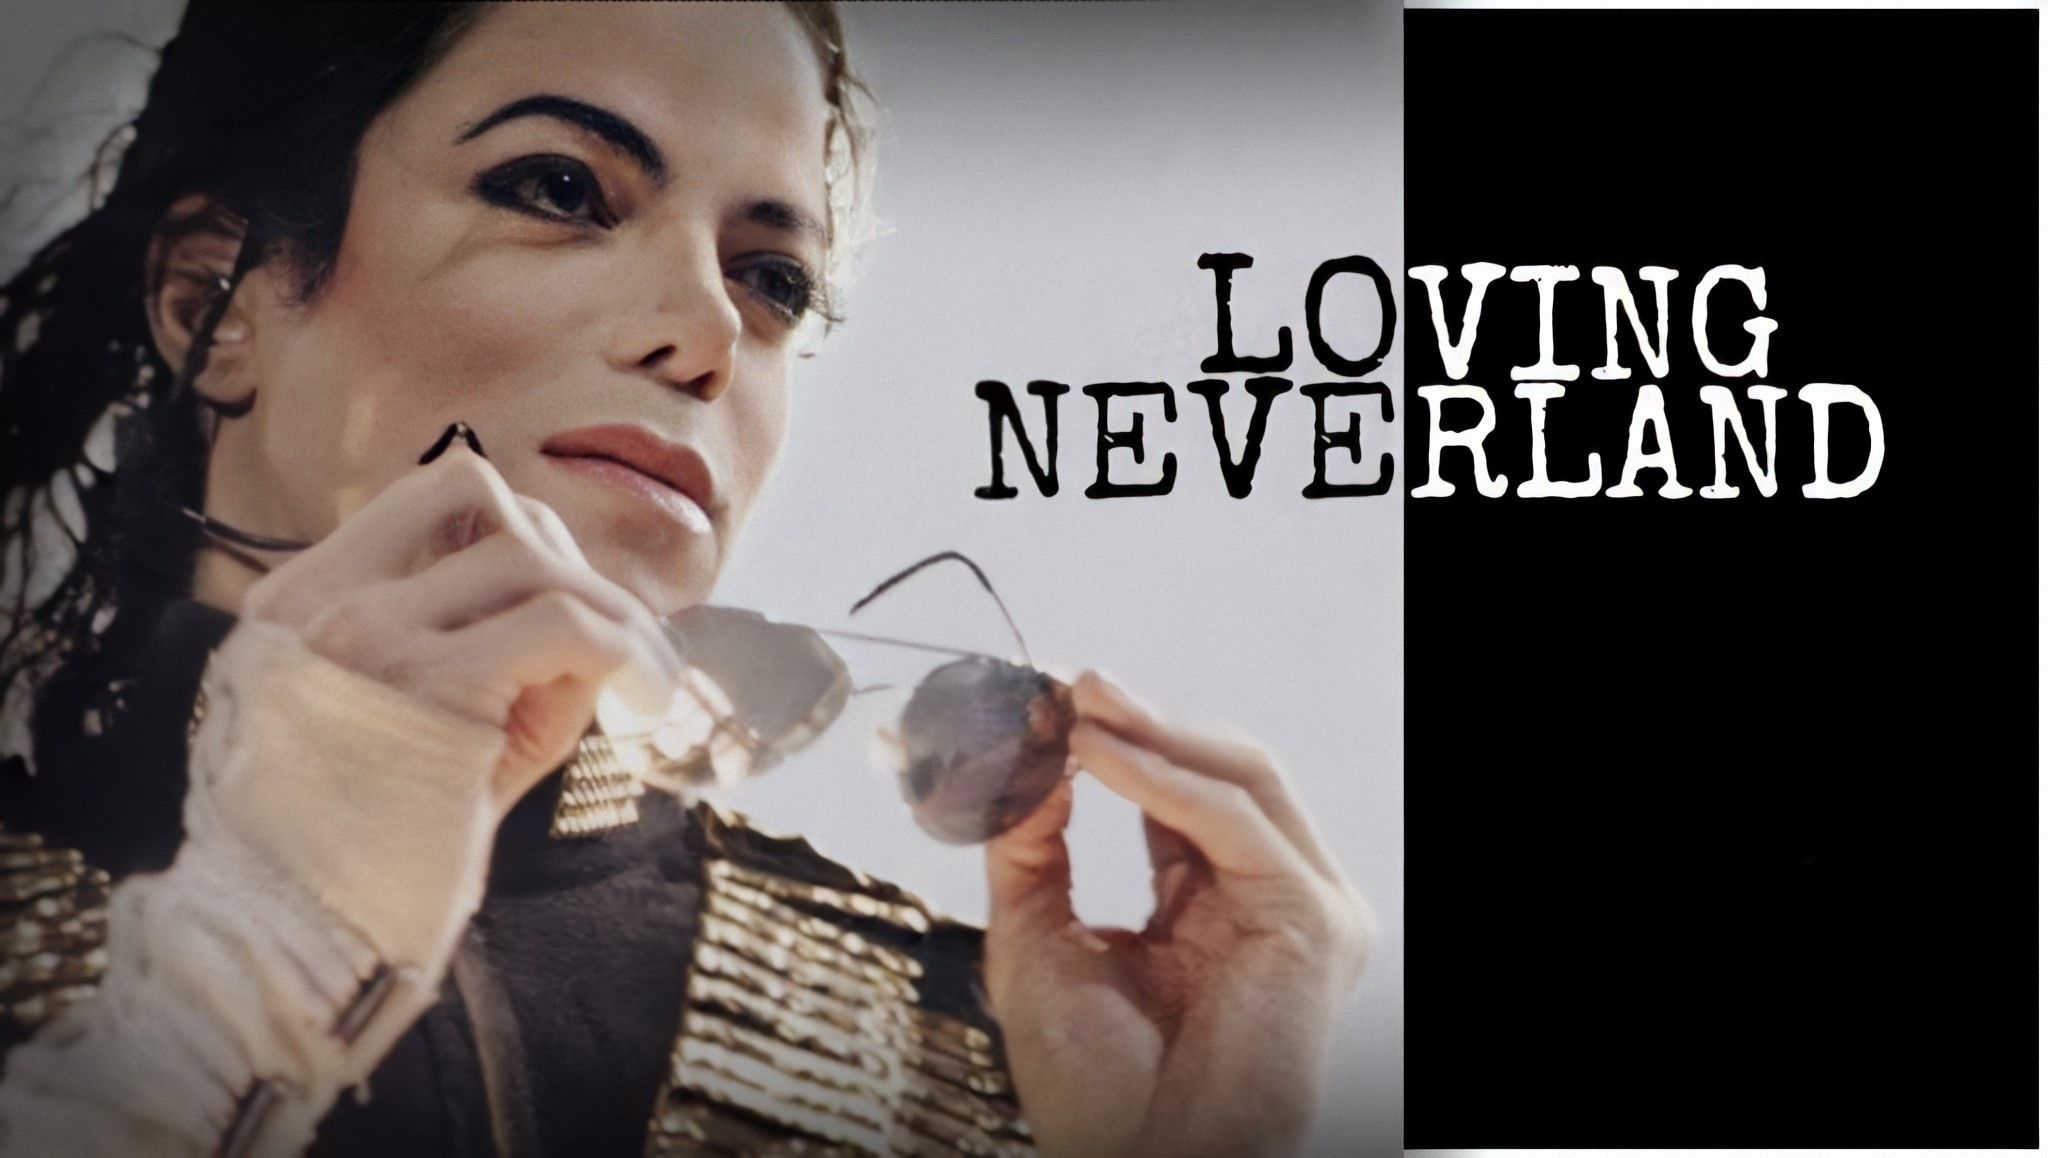 Michael Jackson in Loving Neverland (2020)